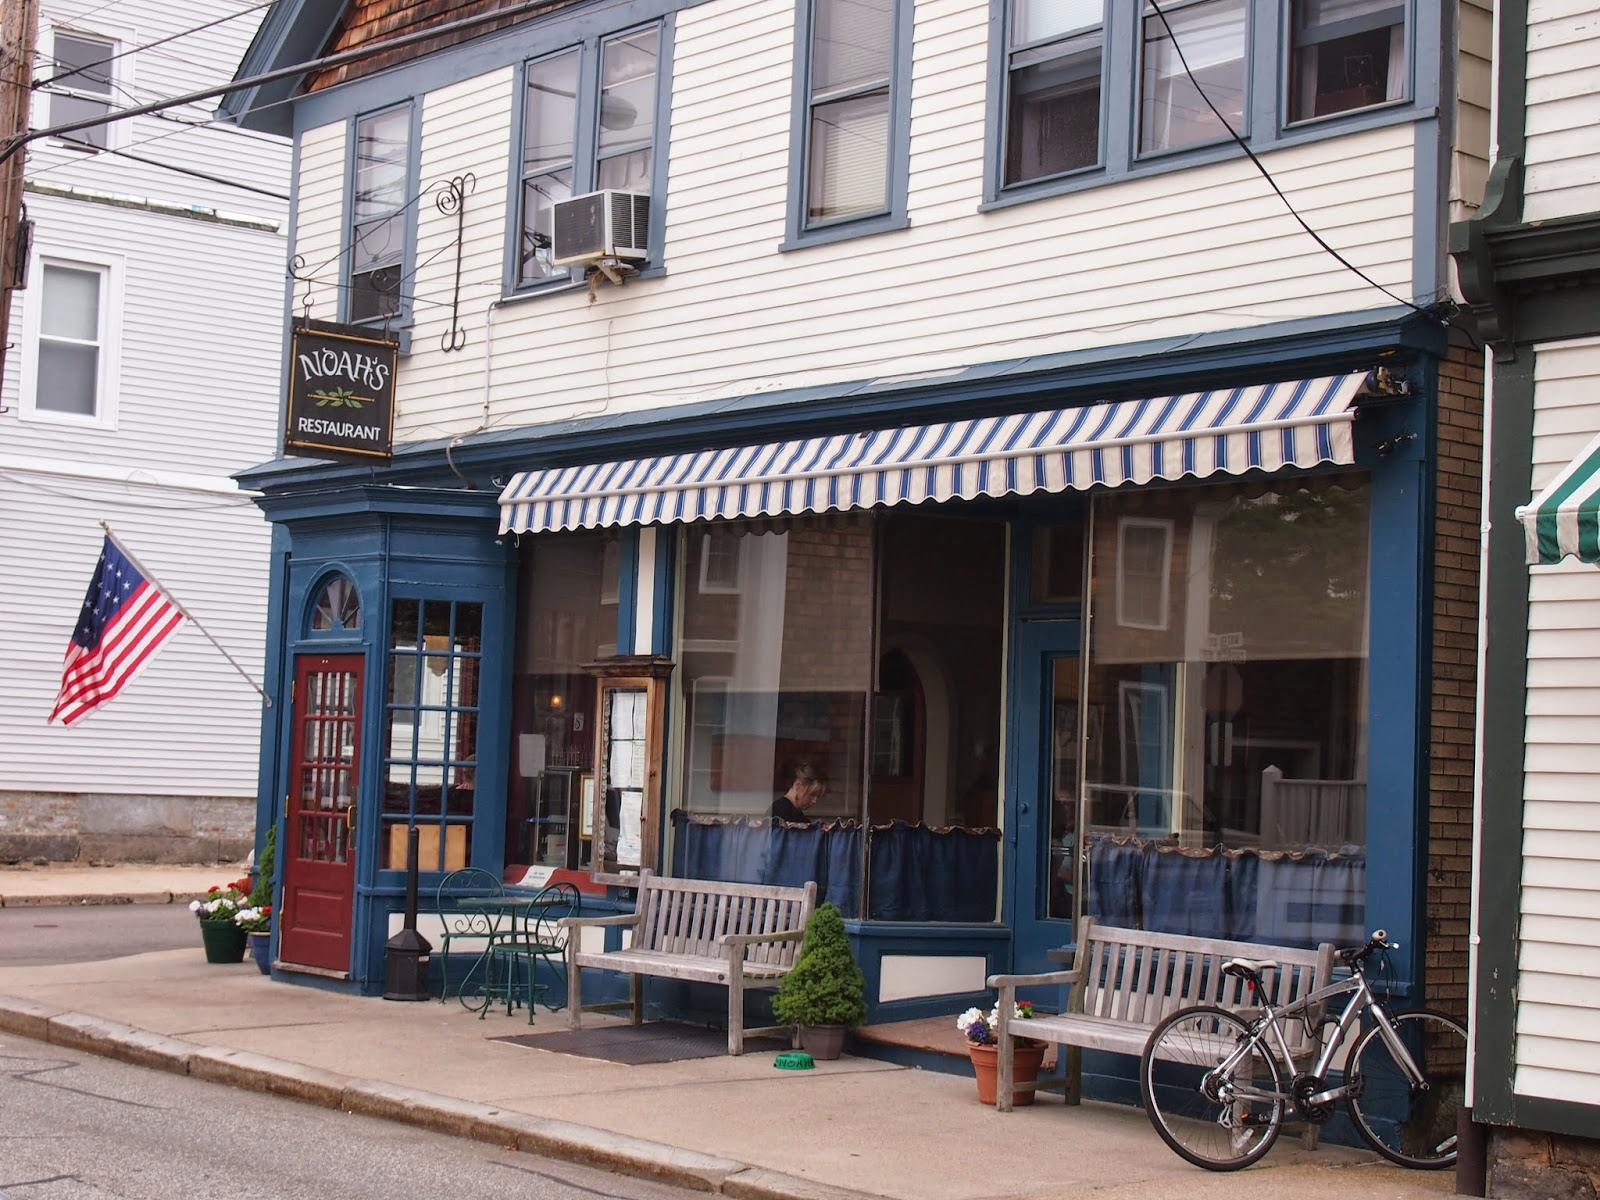 Noah's Cafe in downtown Stonington, Connecticut